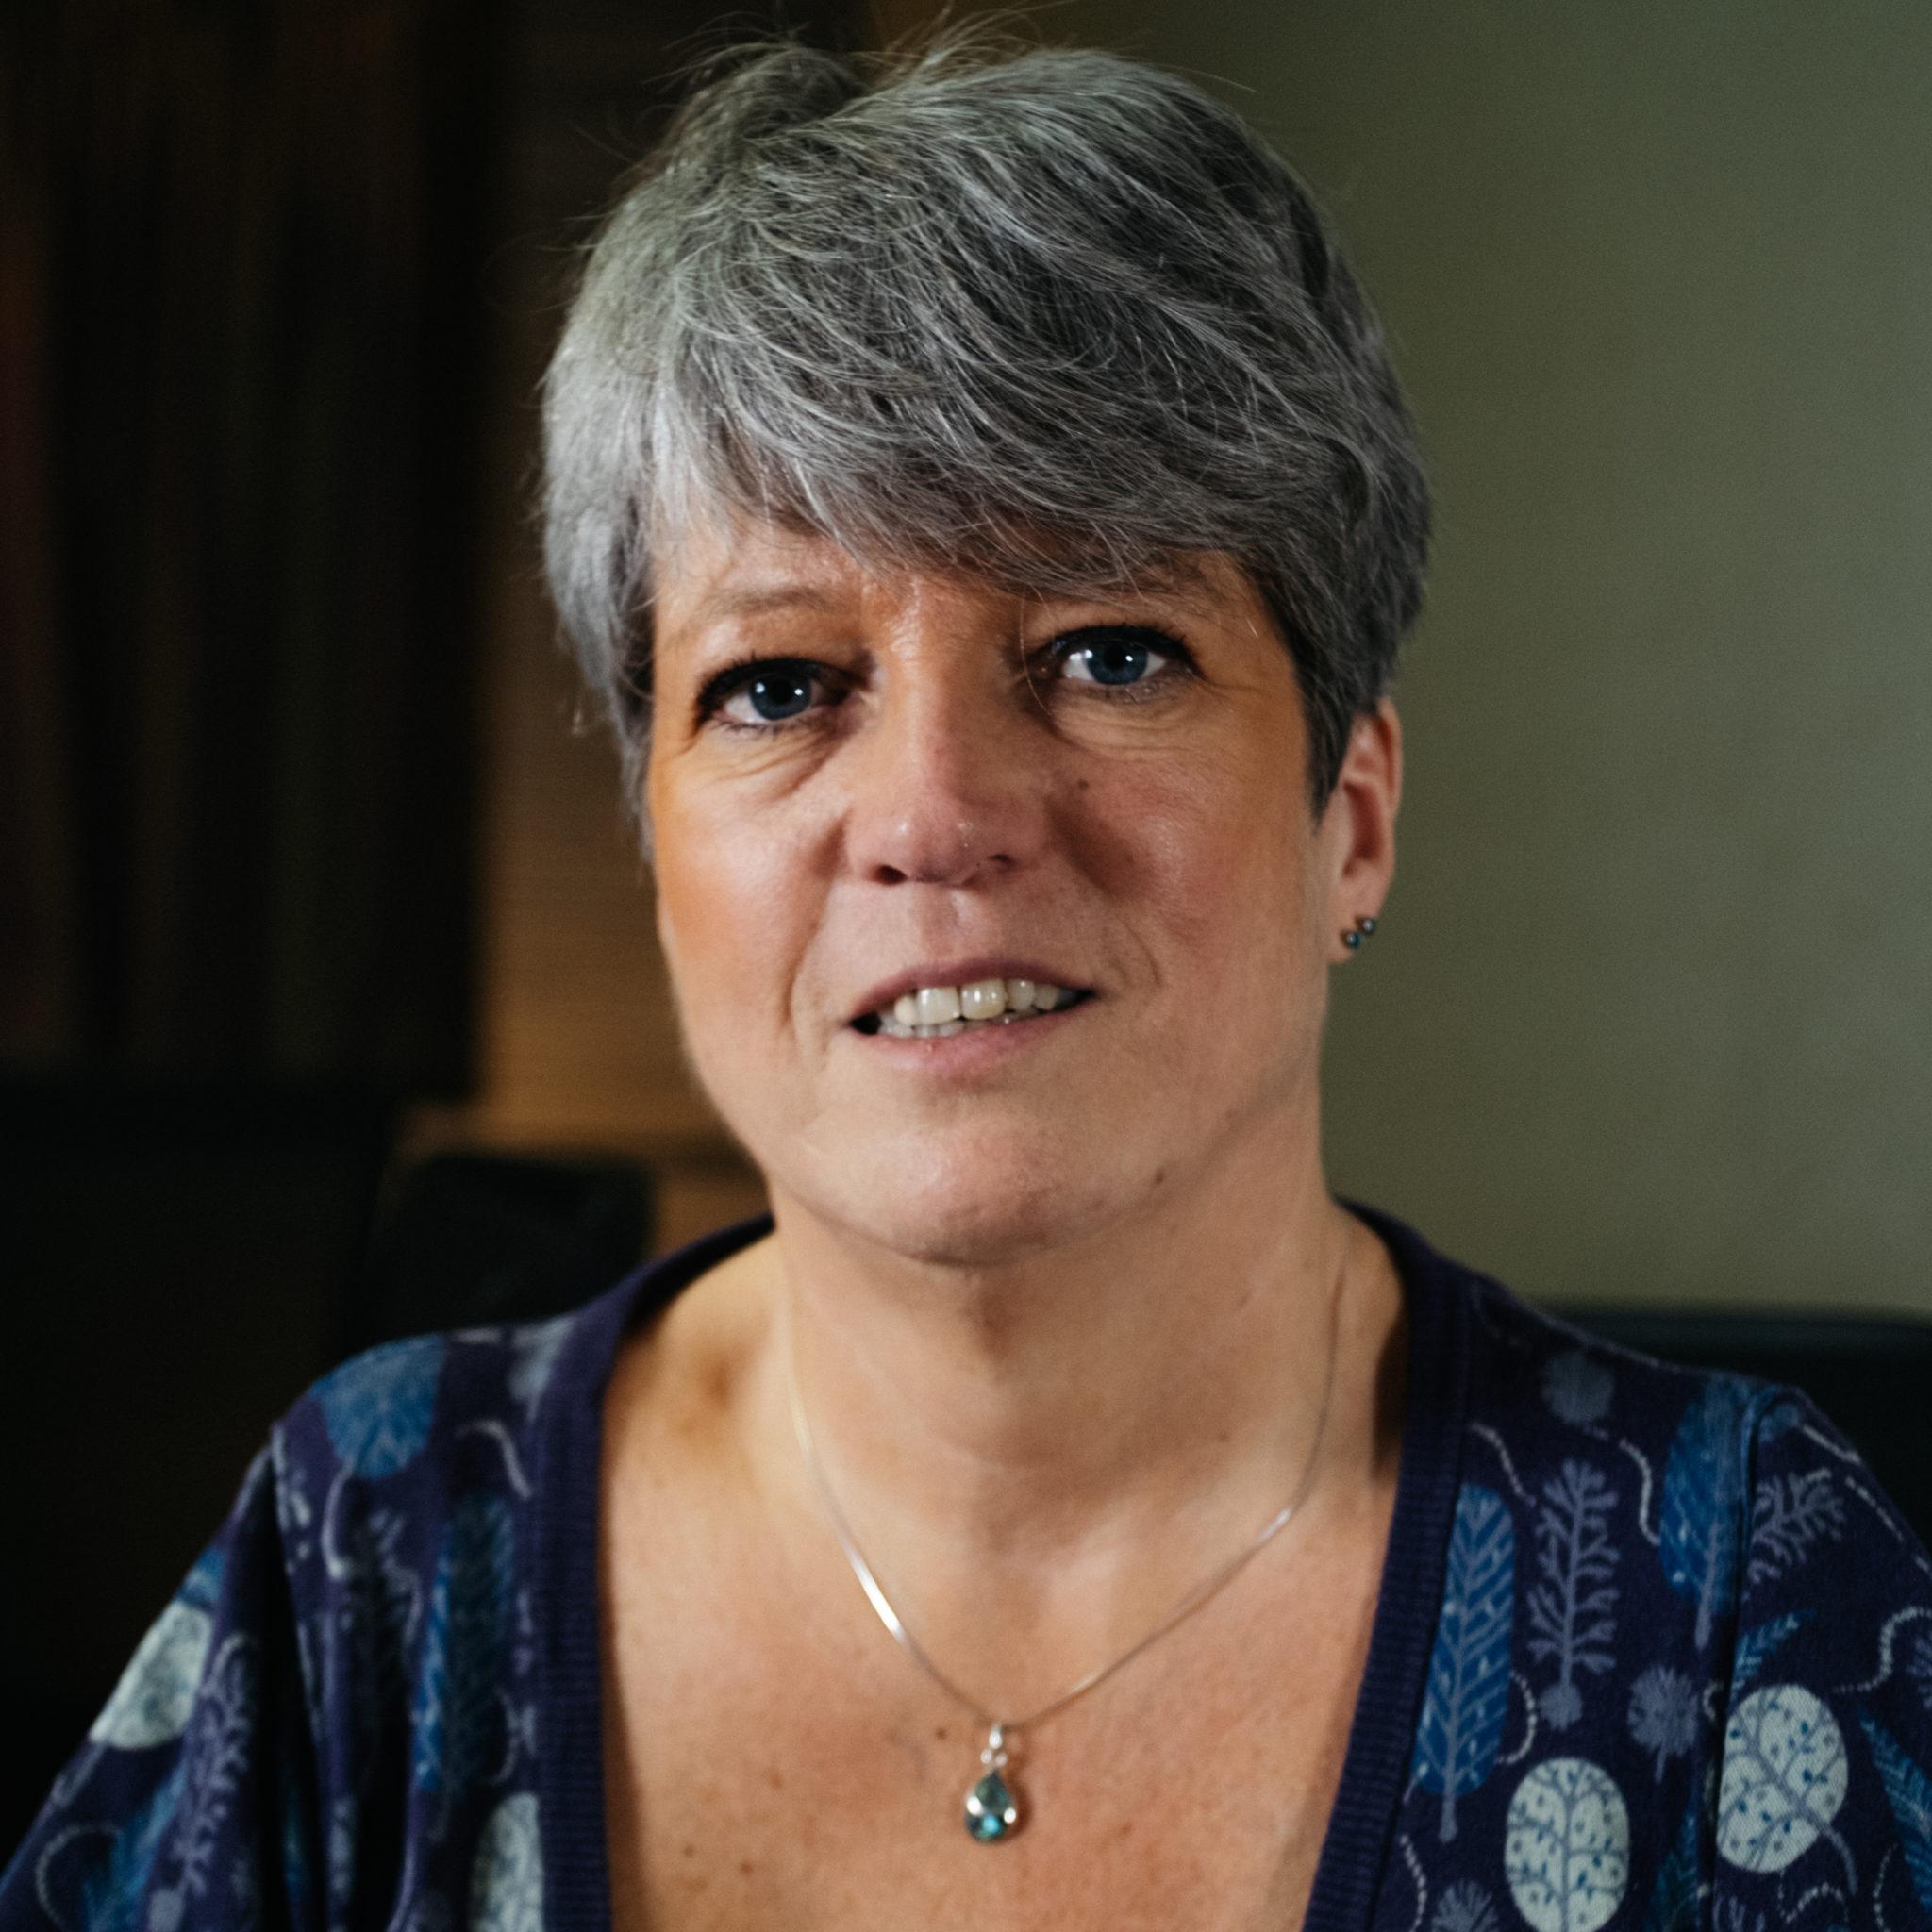 Simone Illger